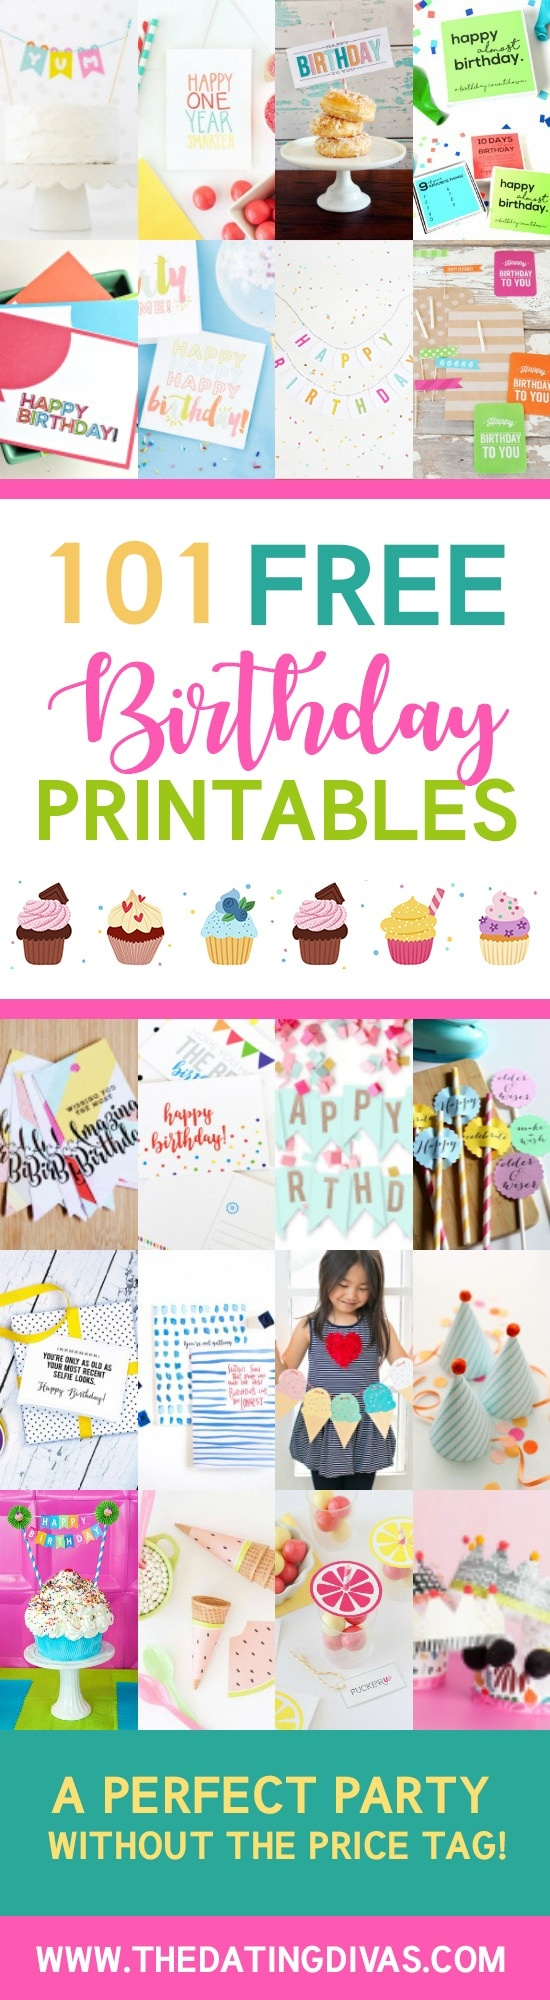 101 Free Birthday Printables - The Dating Divas - Free Birthday Printables